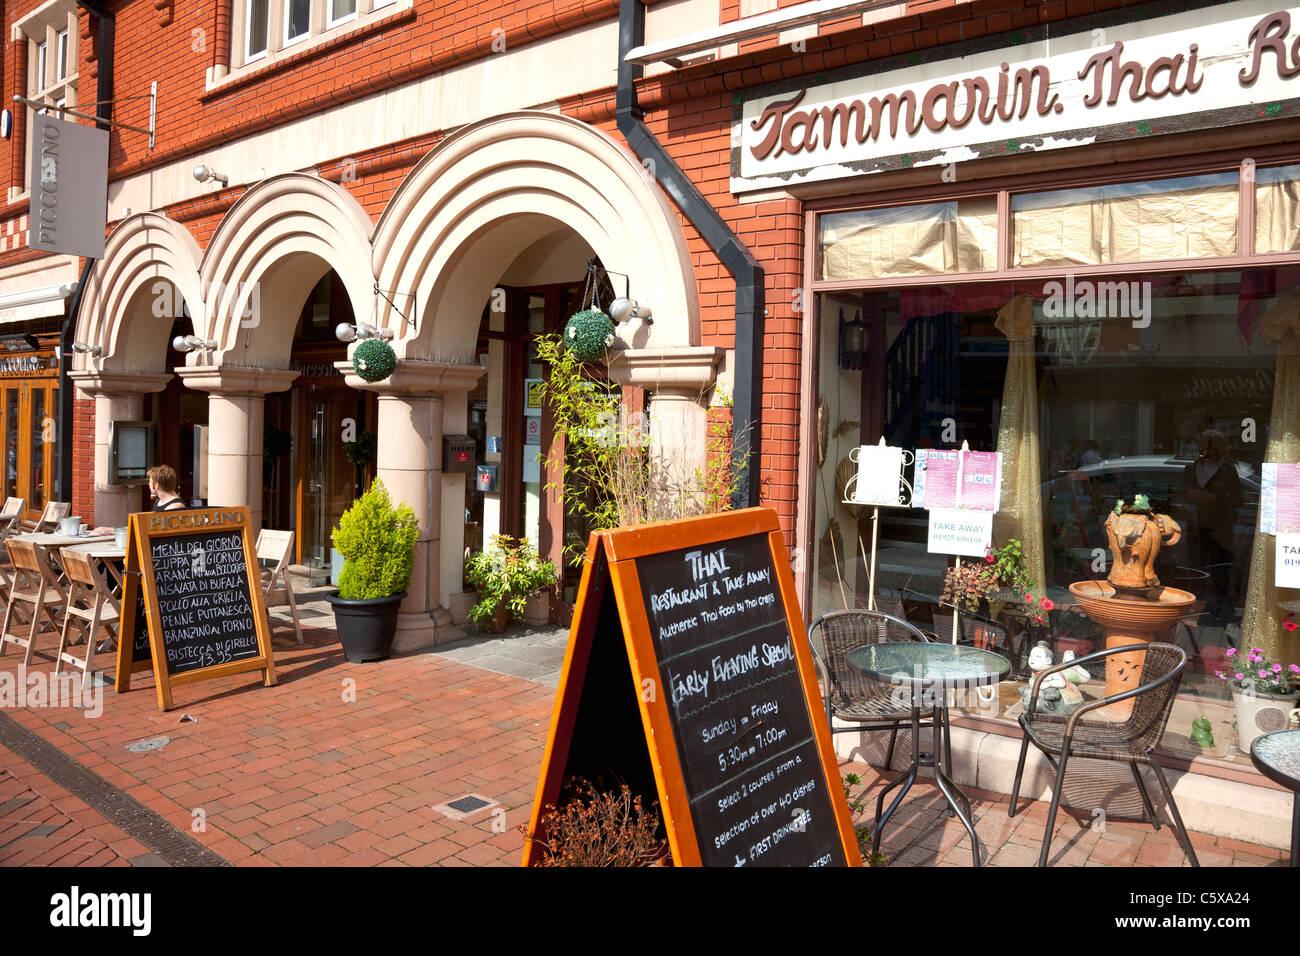 Restaurants along the main road in the village centre, Stockton Heath, Cheshire - Stock Image